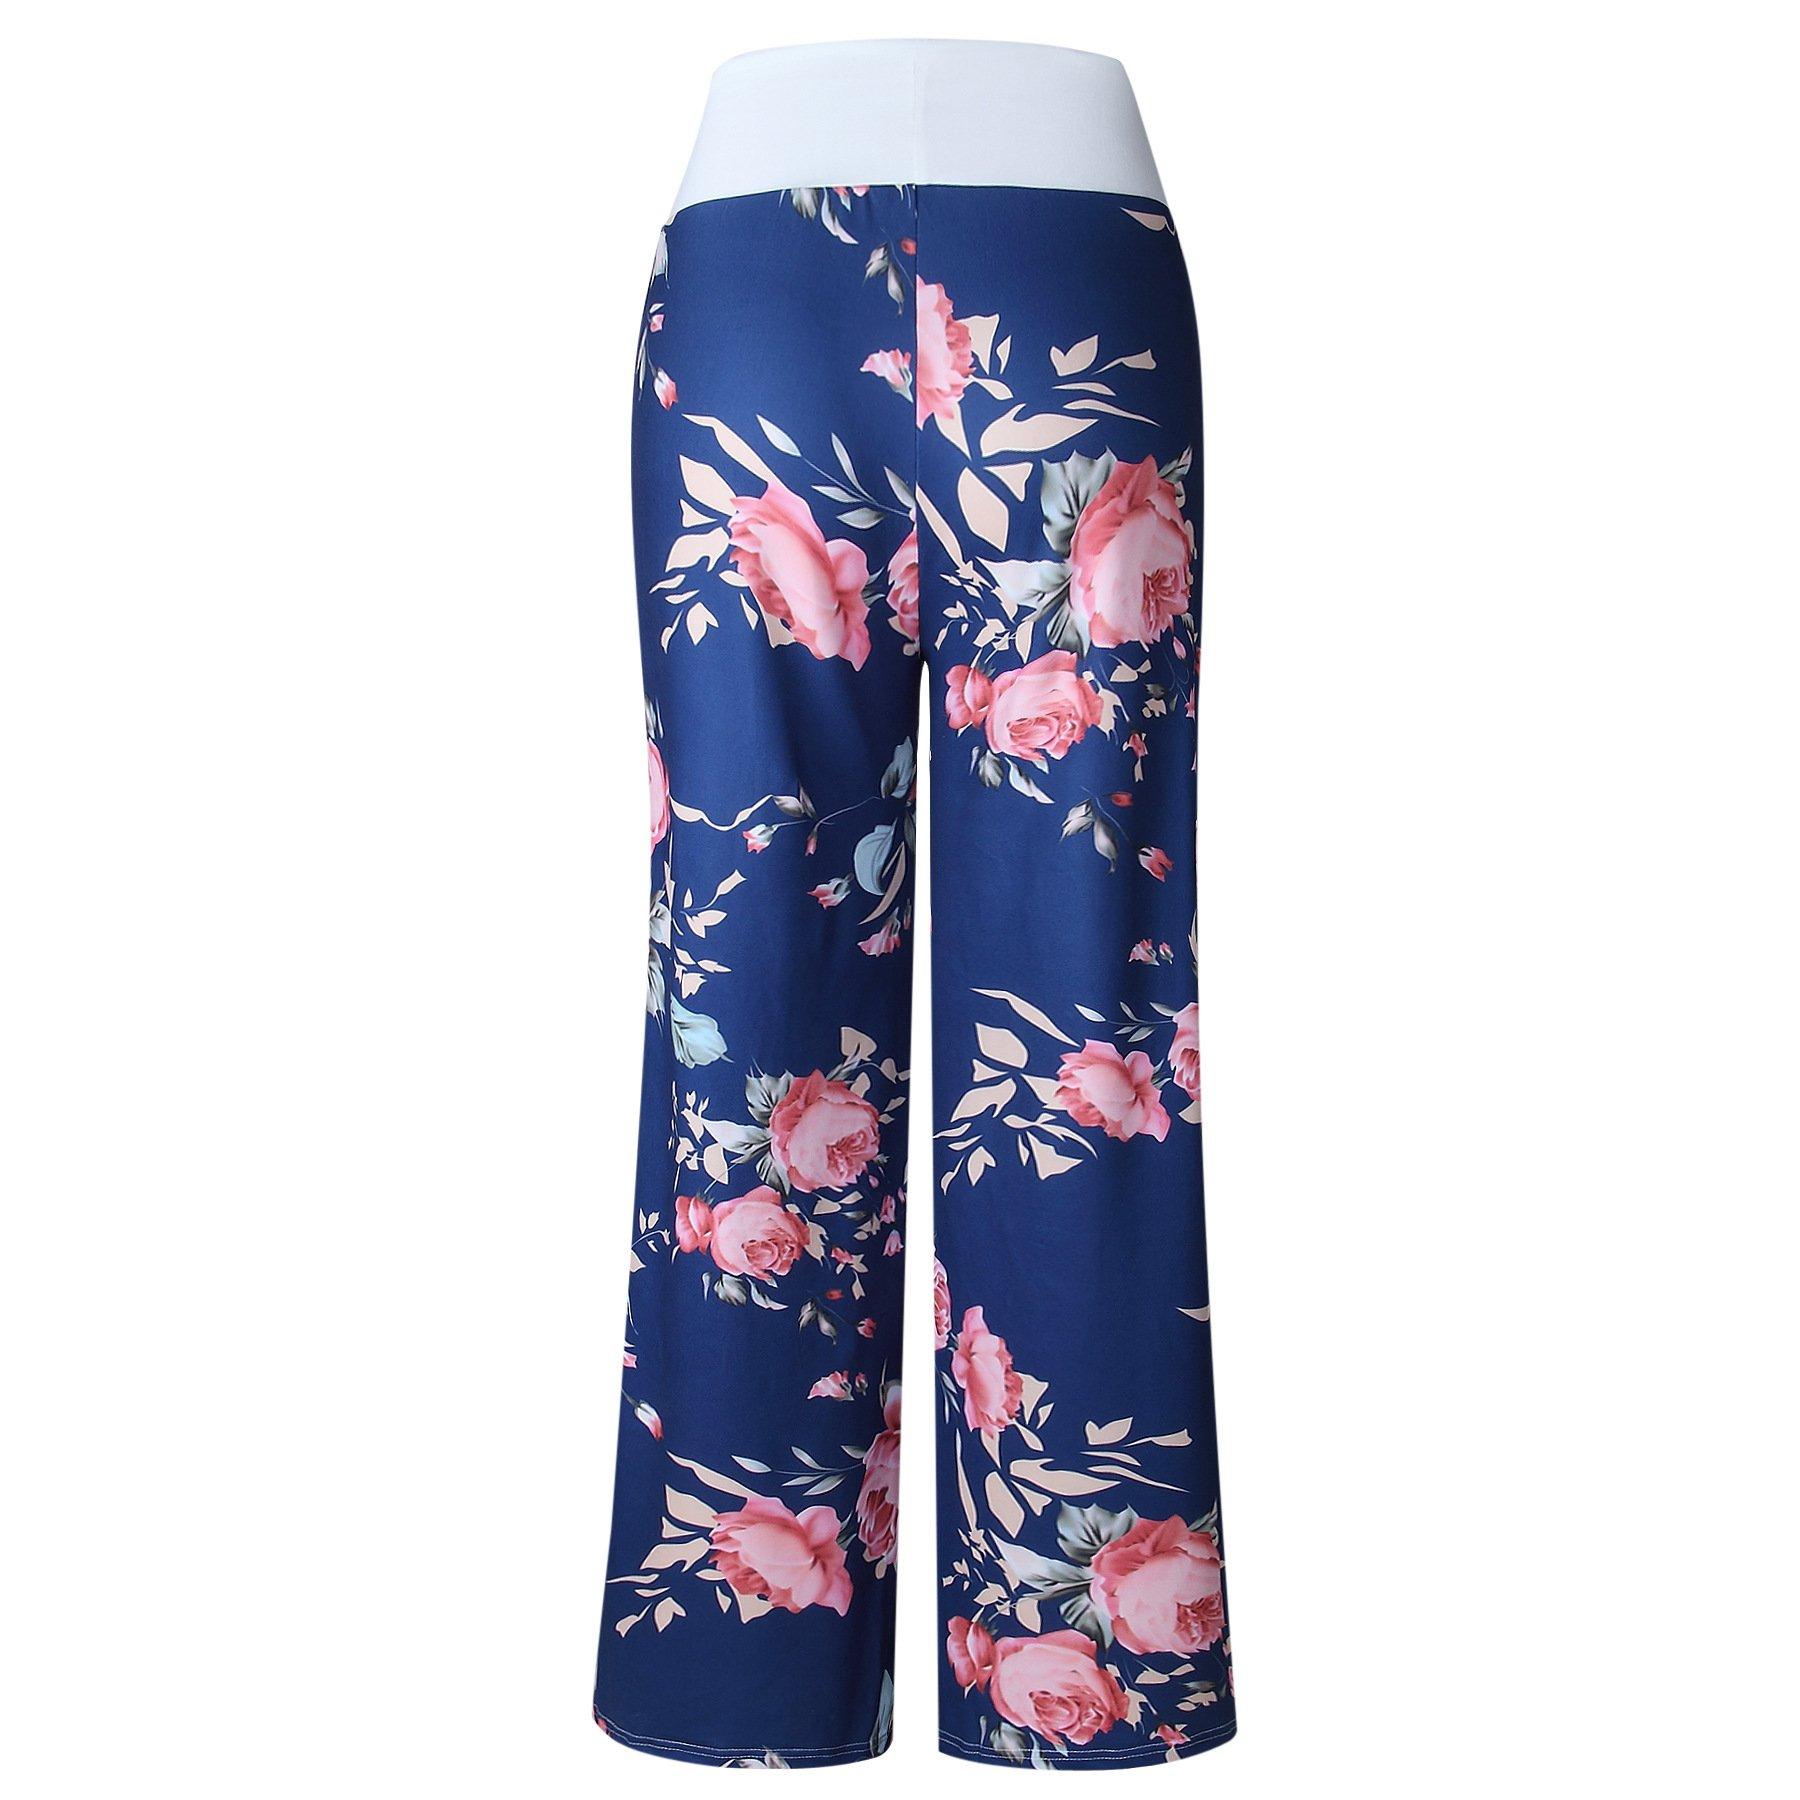 iChunhua Women's Comfy Stretch Floral Print Drawstring Palazzo Wide Leg Lounge Pants(M,Blue) by iChunhua (Image #4)